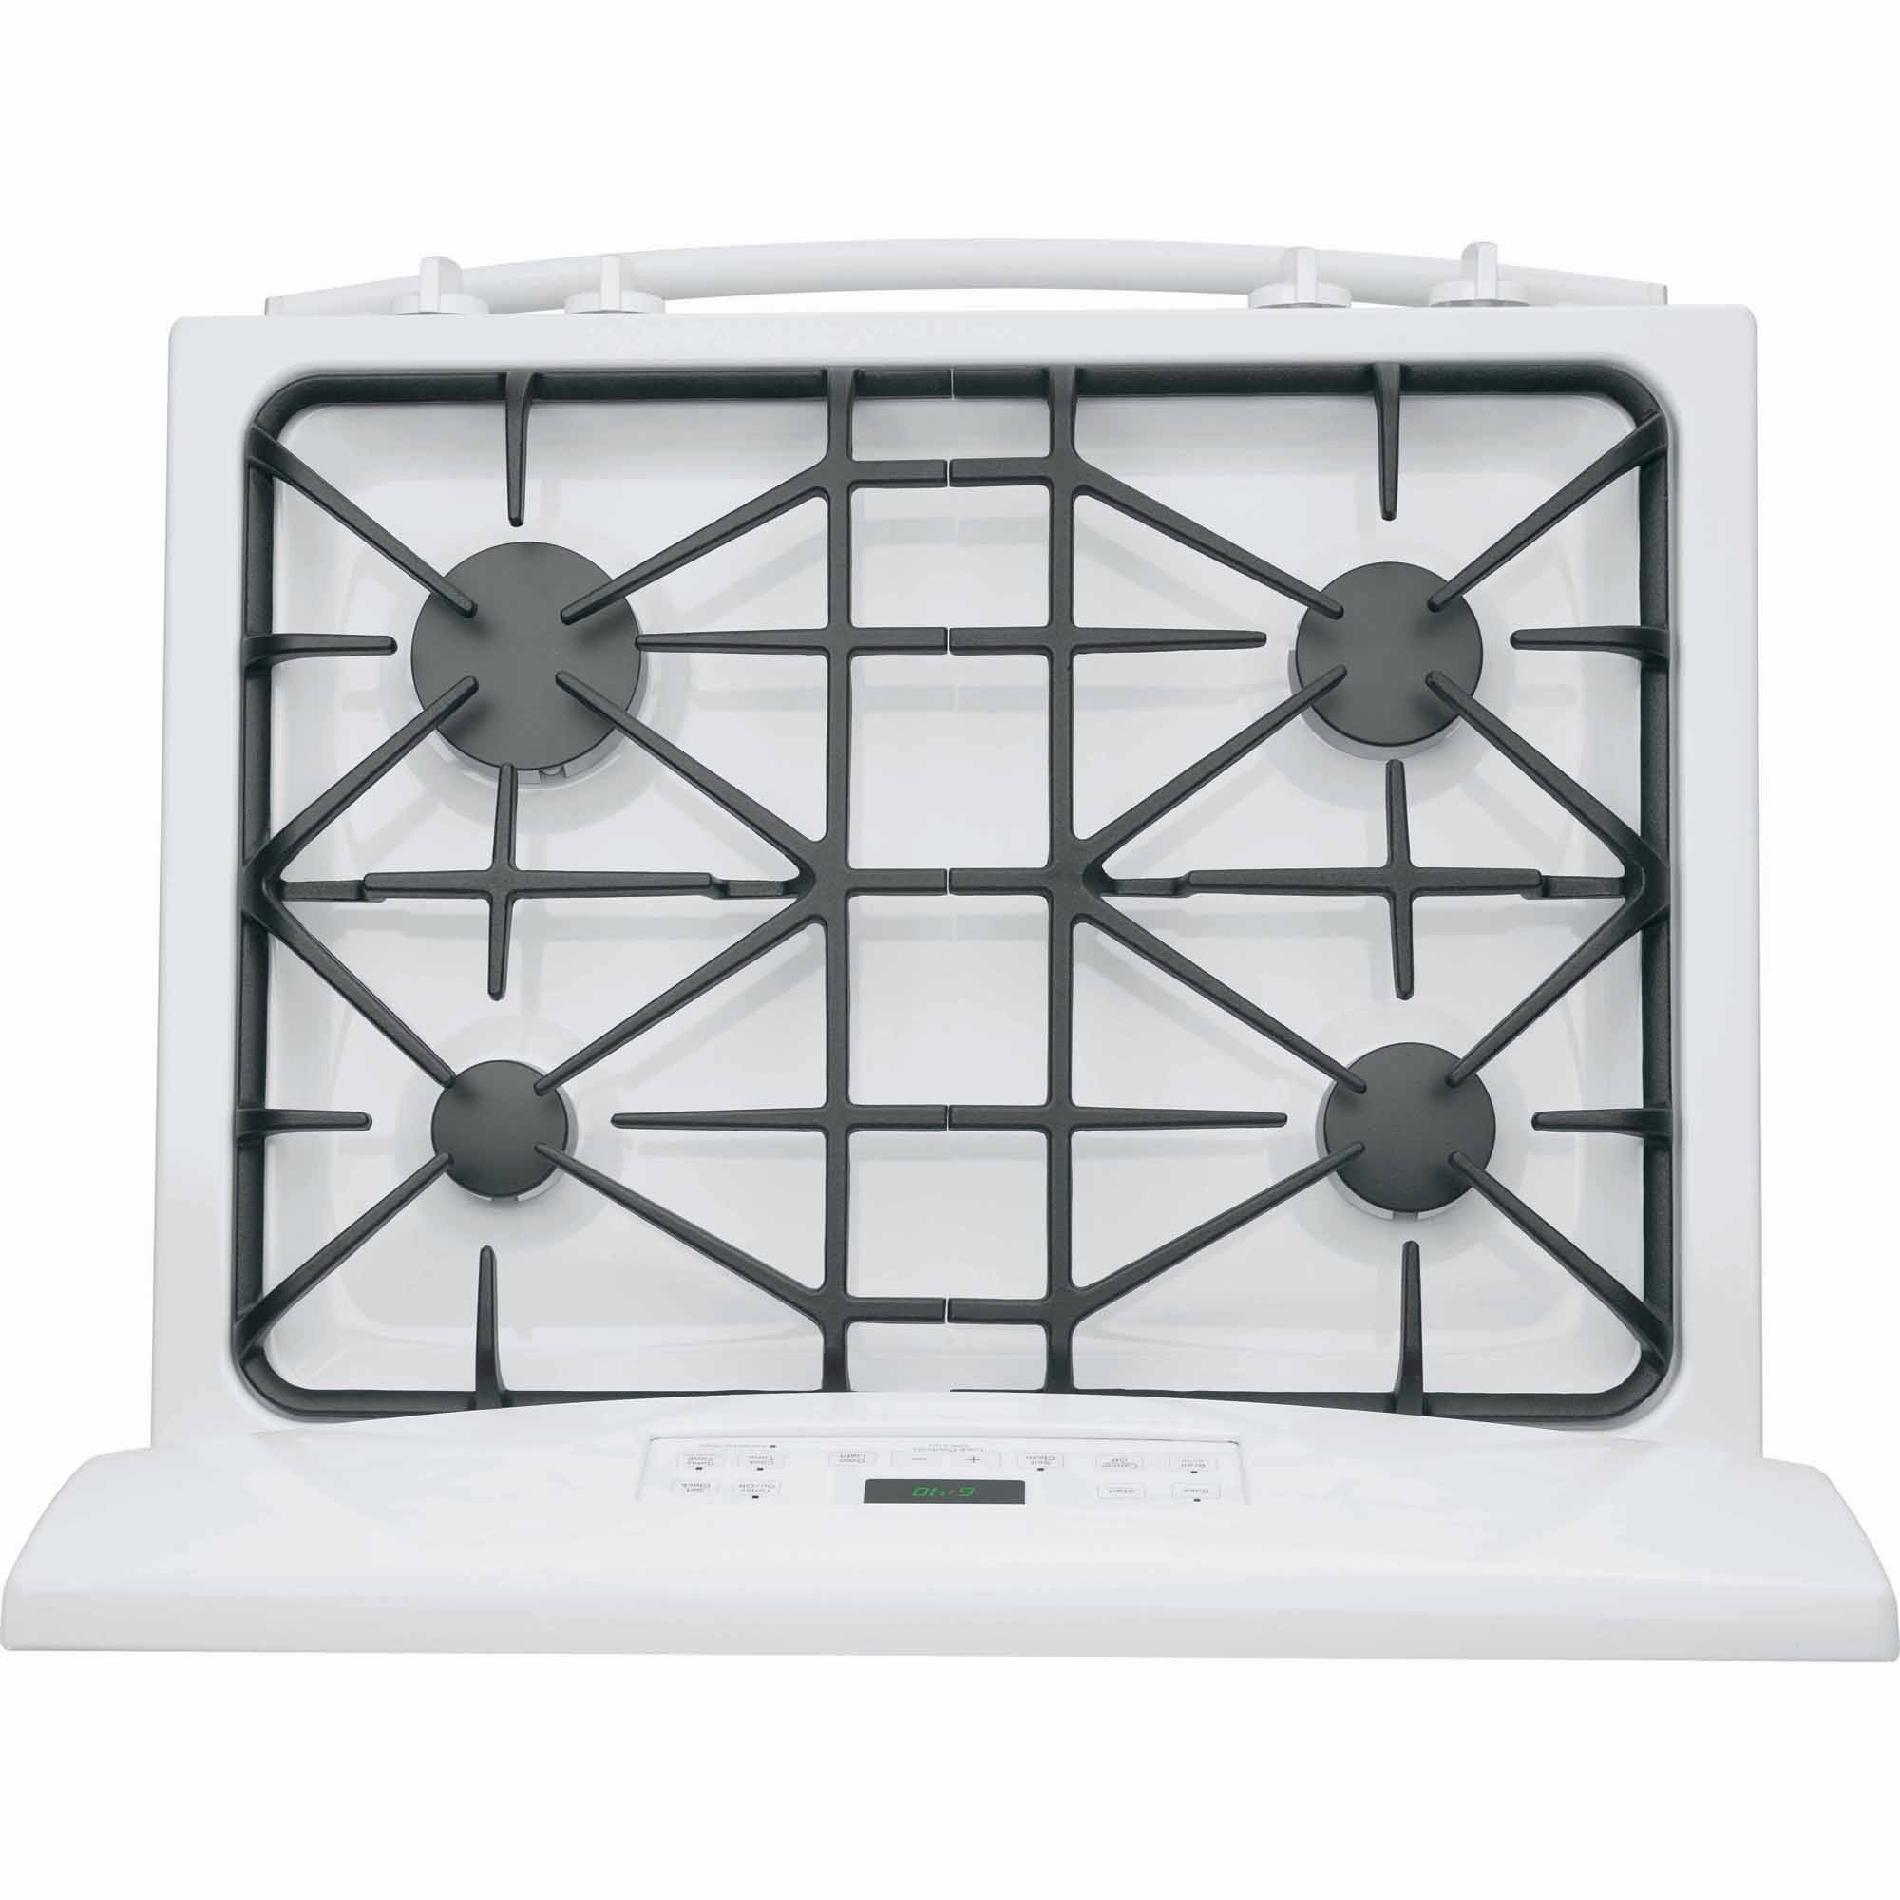 GE Appliances JGB640DEFWW 5.0 cu. ft. Gas Range - White